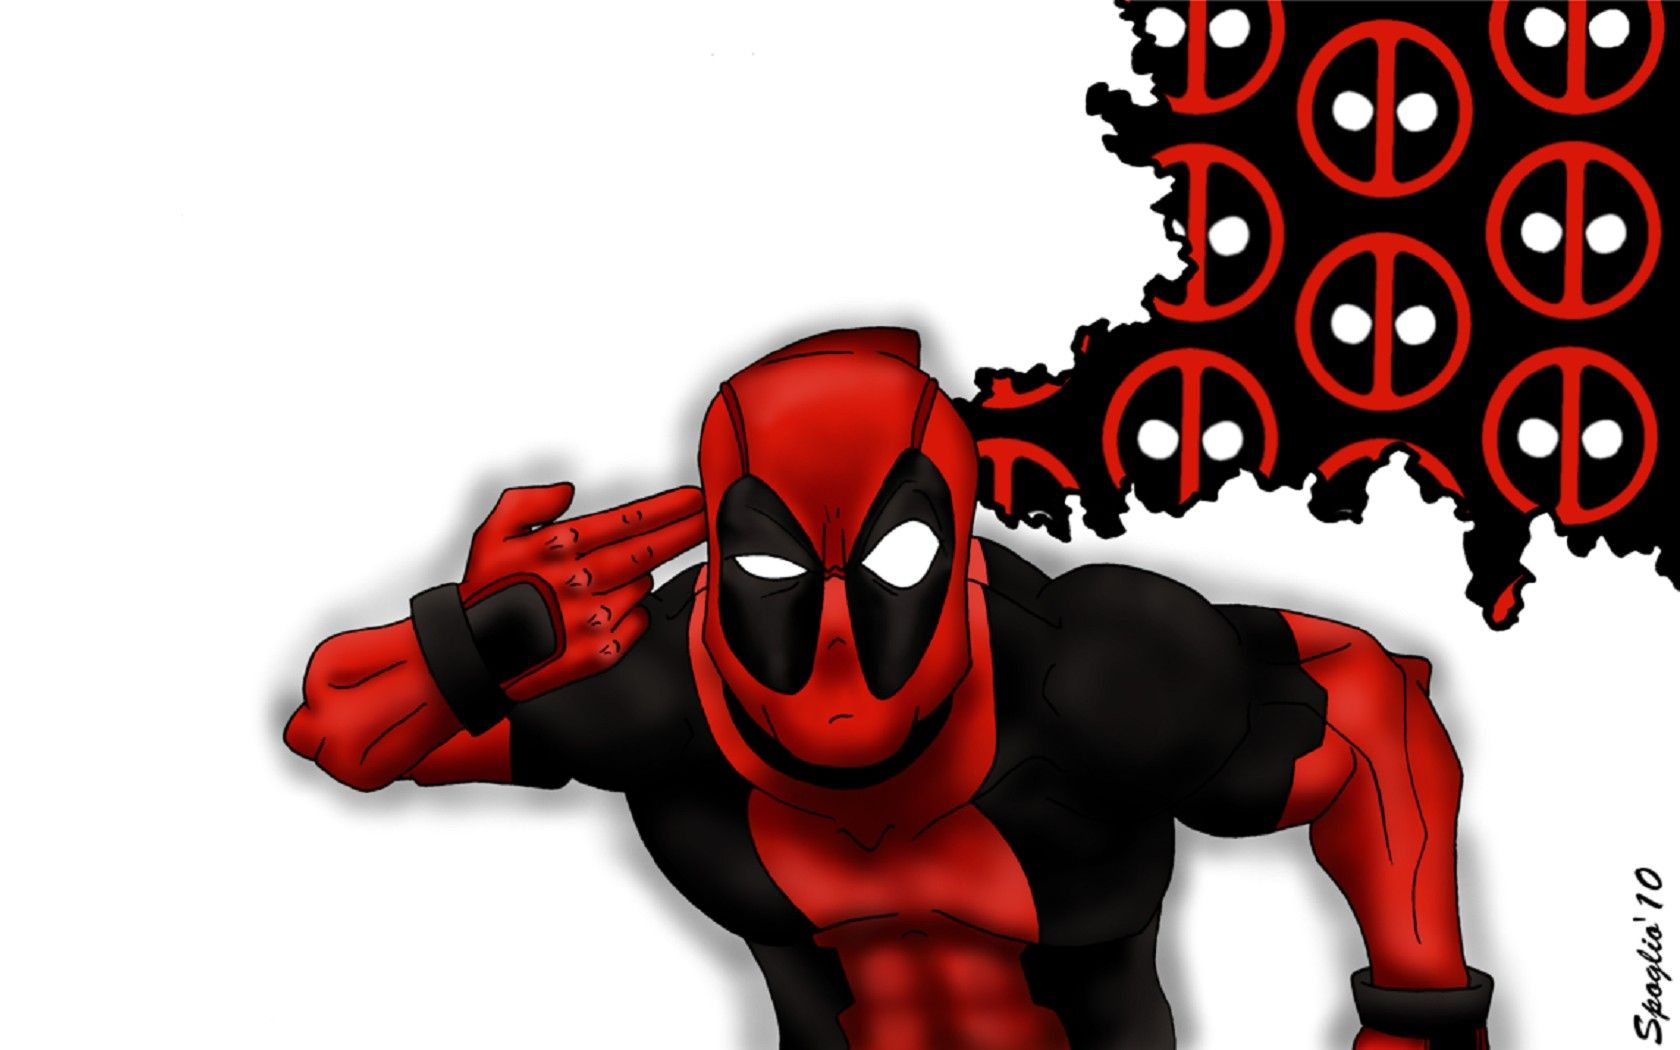 Pin by Катруся on Deadpool Deadpool wallpaper, Black